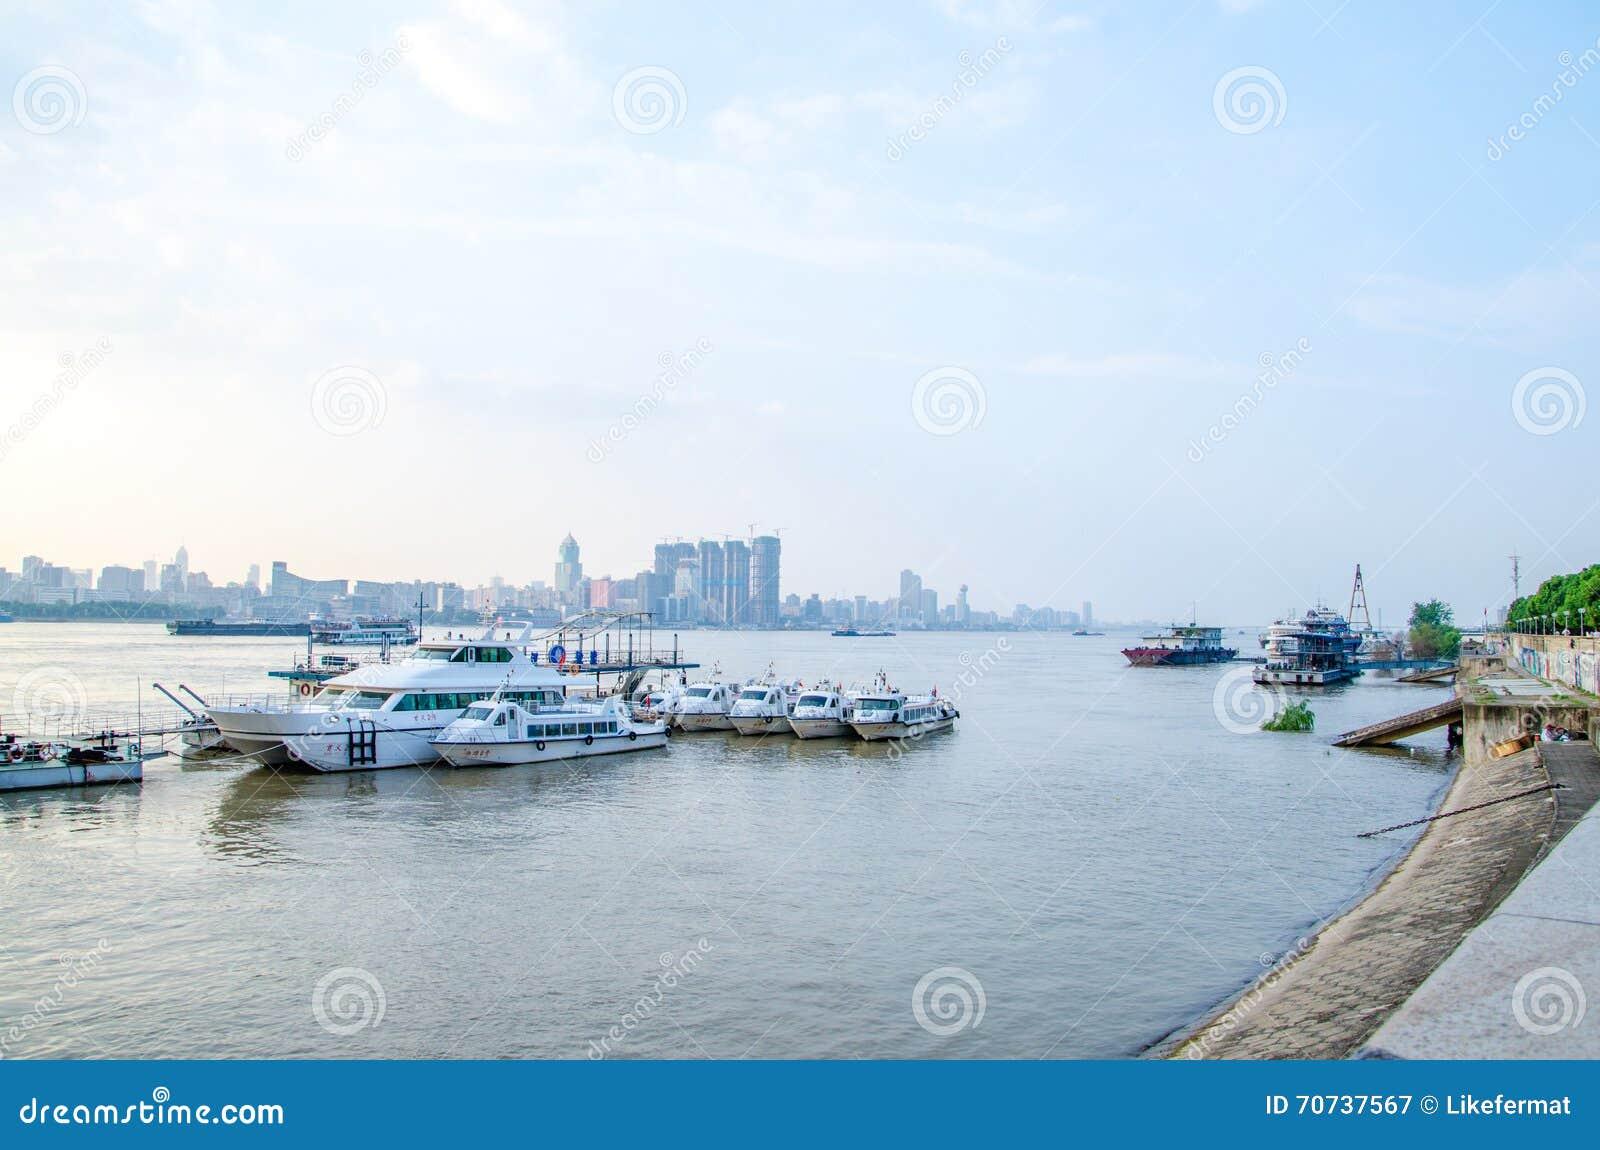 City of Wuhan, China